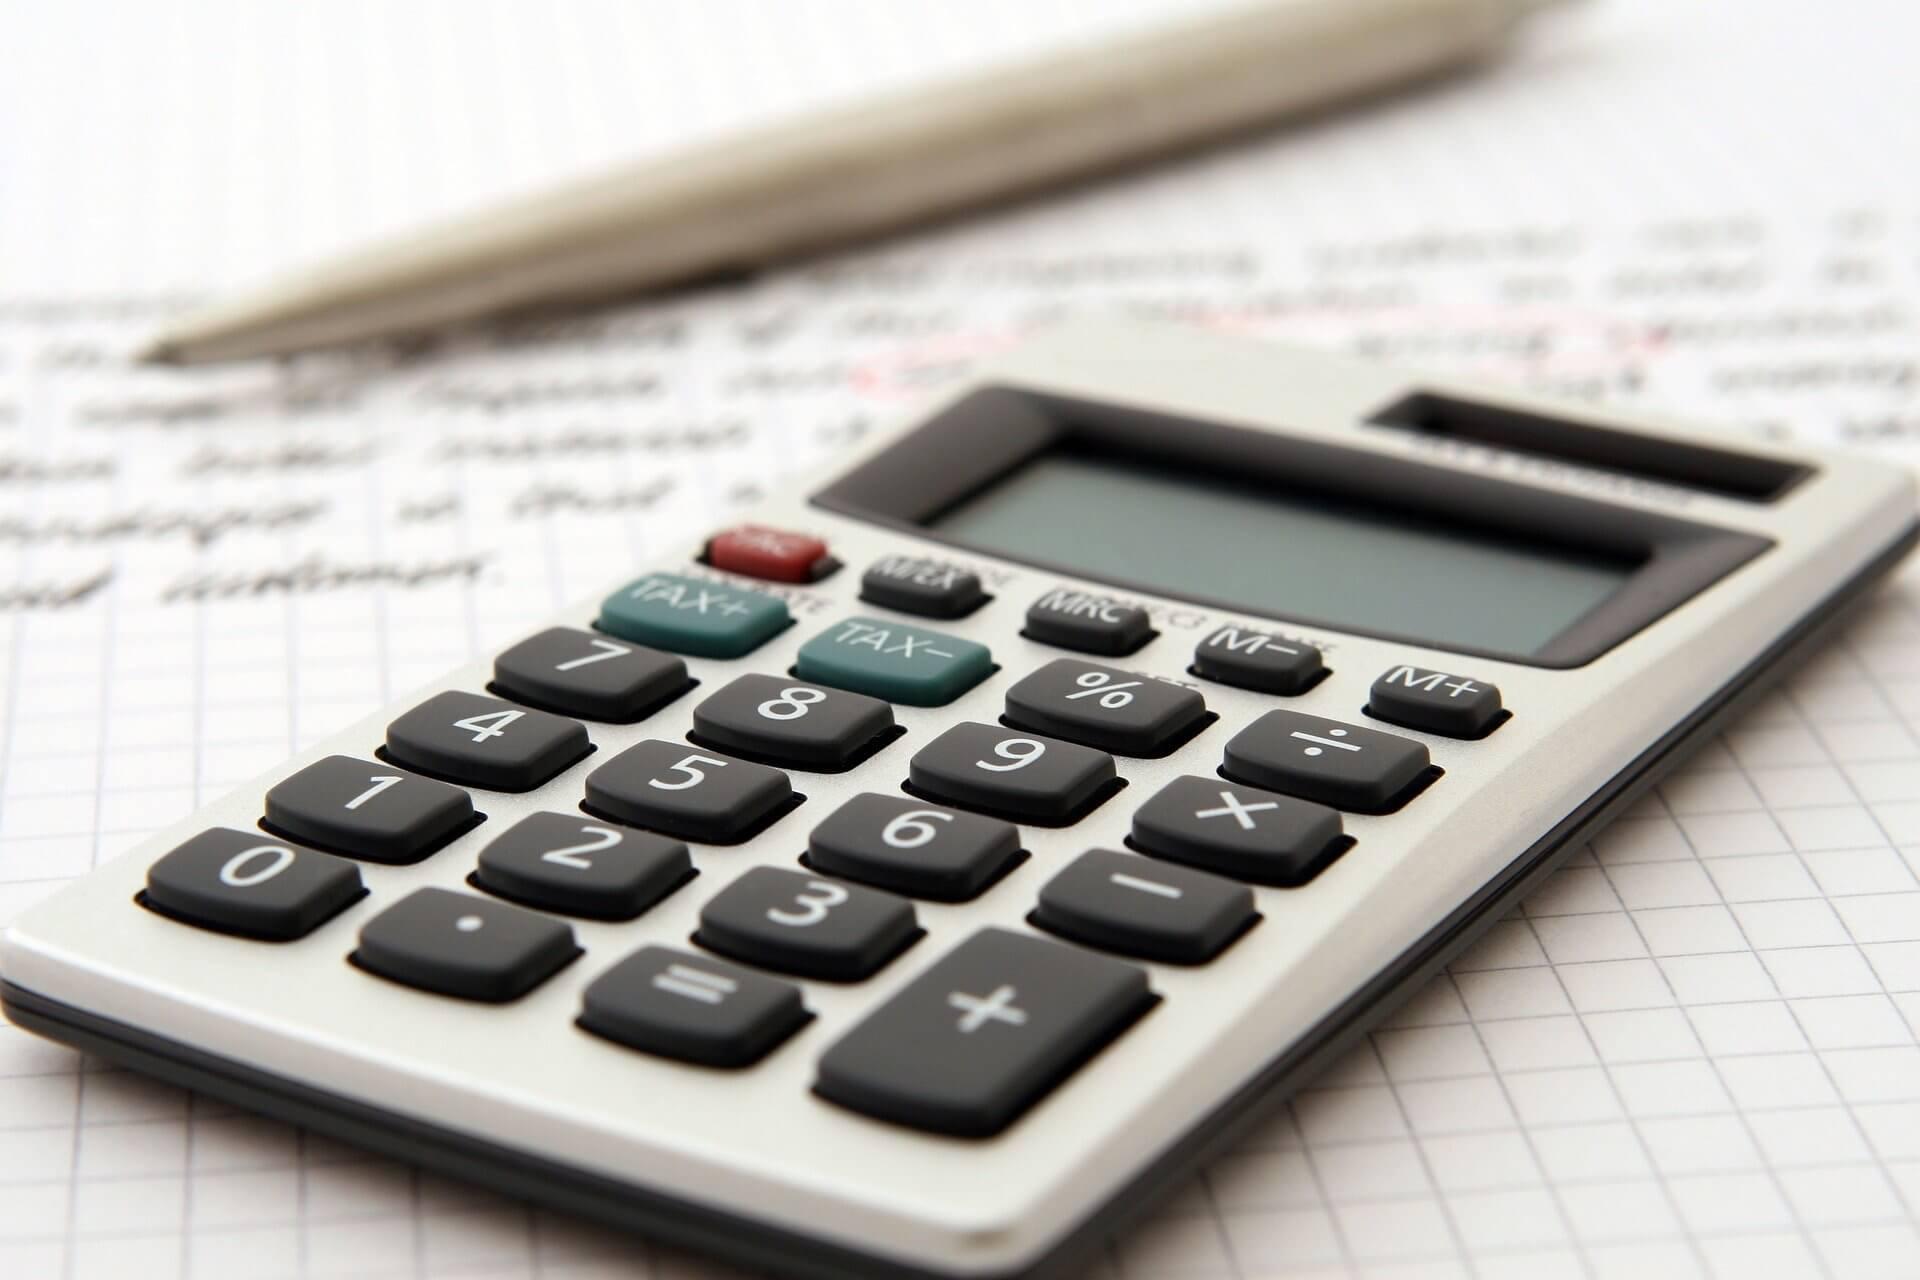 accountant-1238598_1920 店舗改修の費用を仕訳する際の勘定科目に関するポイントをご紹介します!